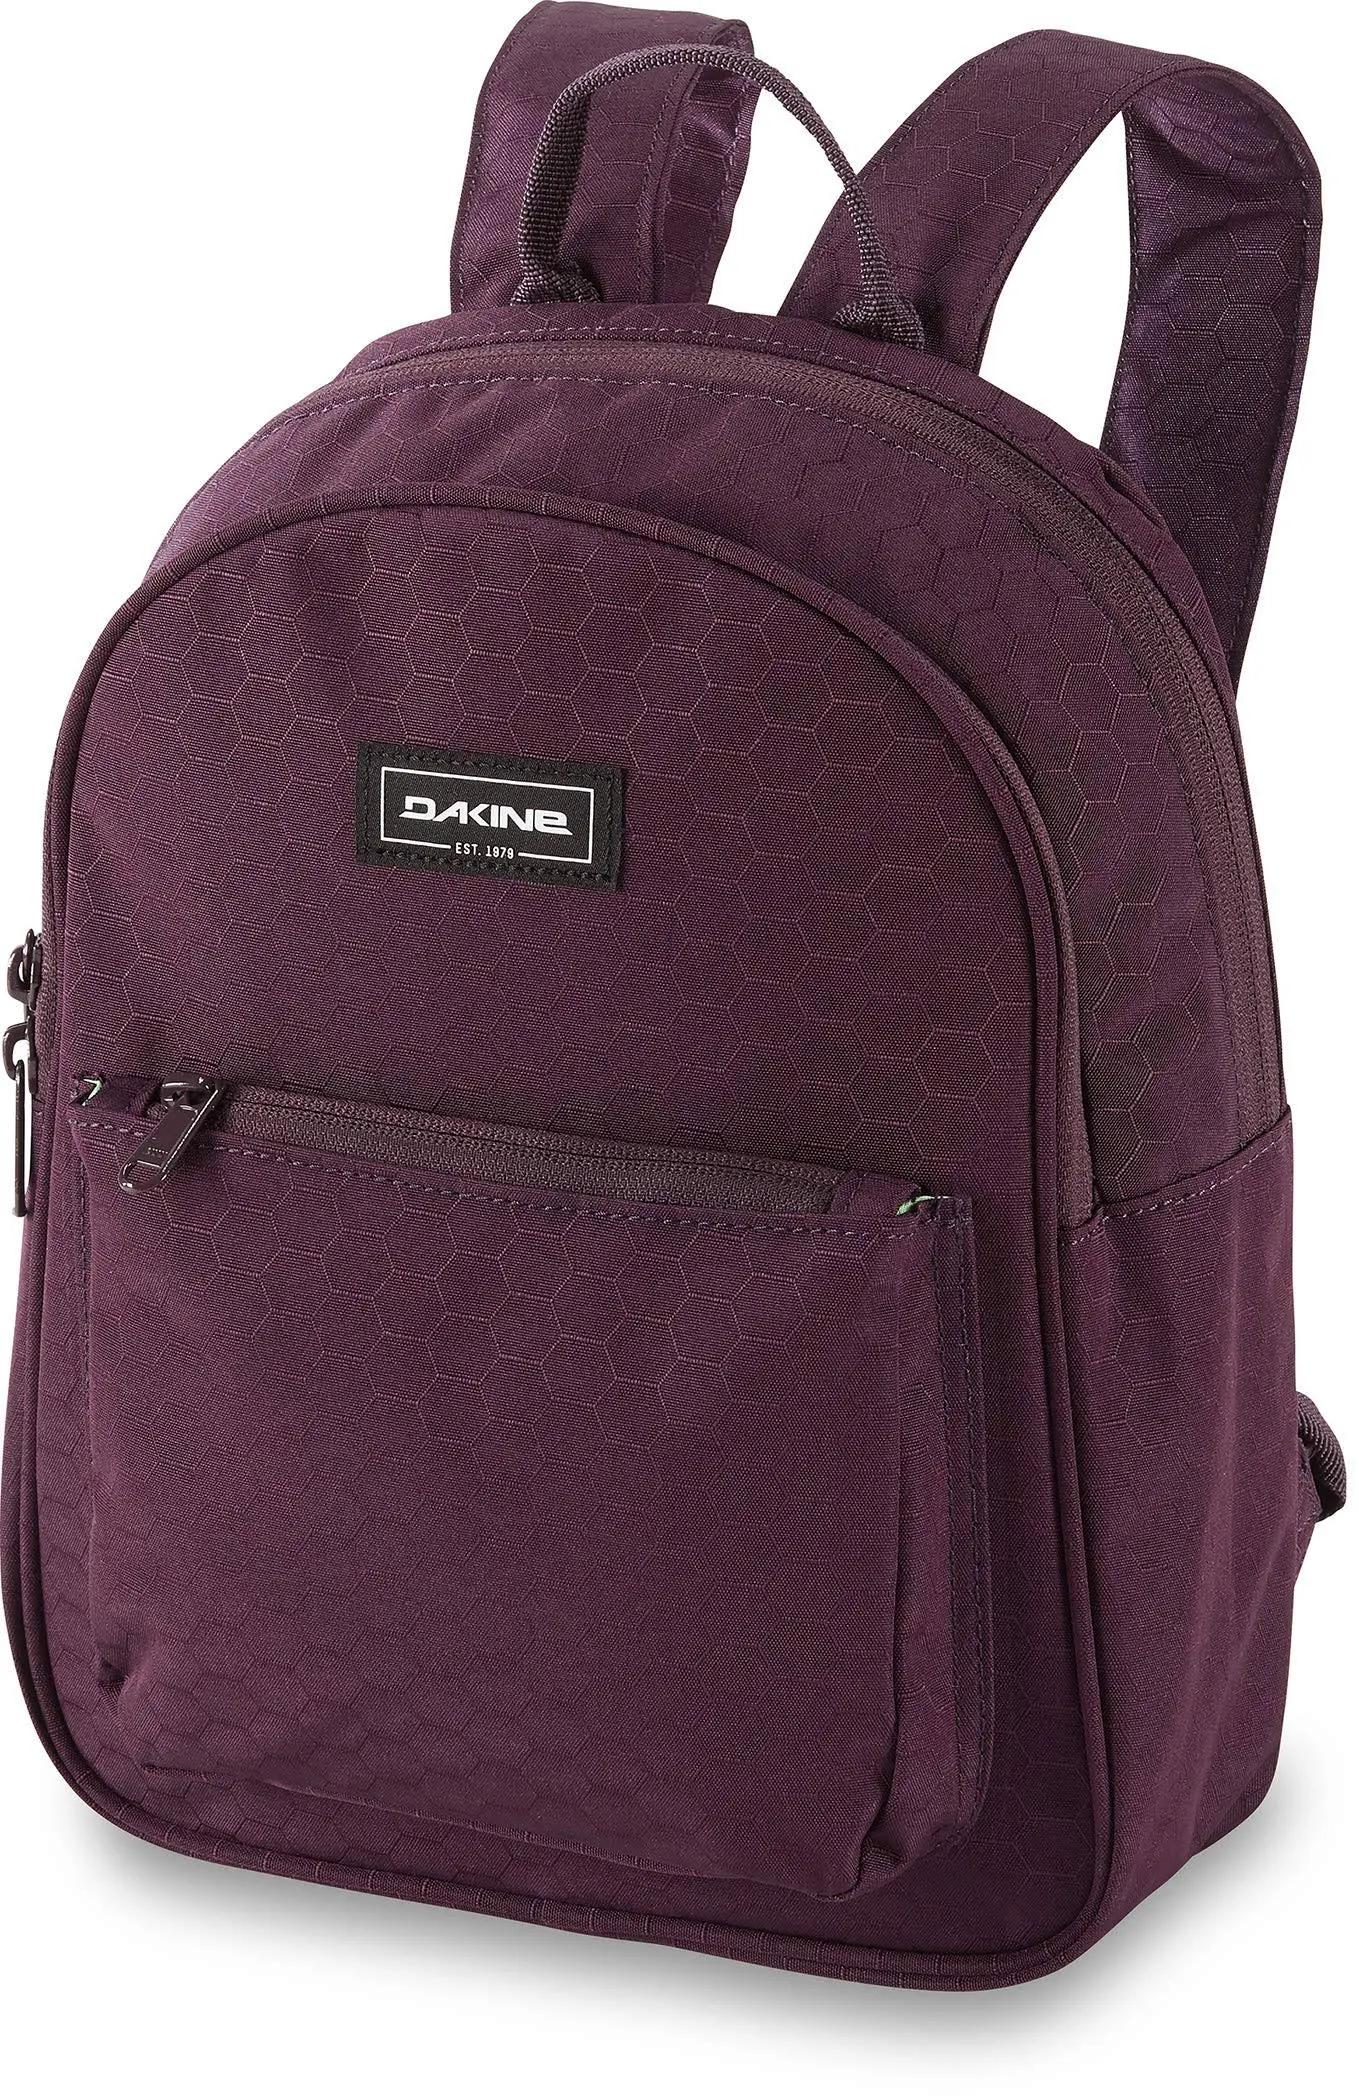 Dakine Pack Mini 7L rugzak Mudded Mauve voor €7,25 @ Amazon.nl